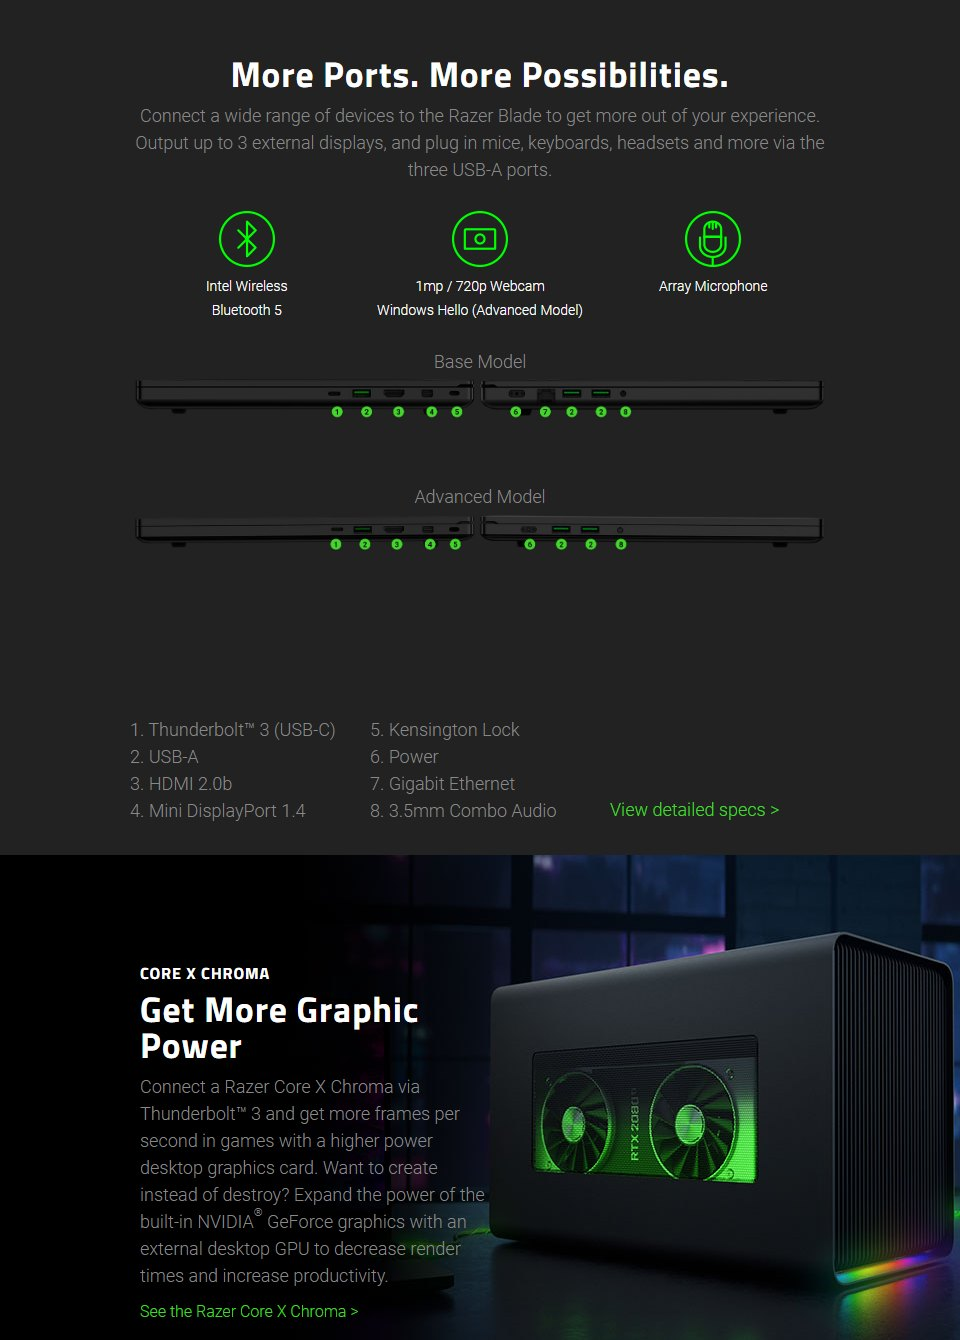 Razer Blade Core i7 RTX 2070 15.6in 240hz Notebook [03137E02] features 5